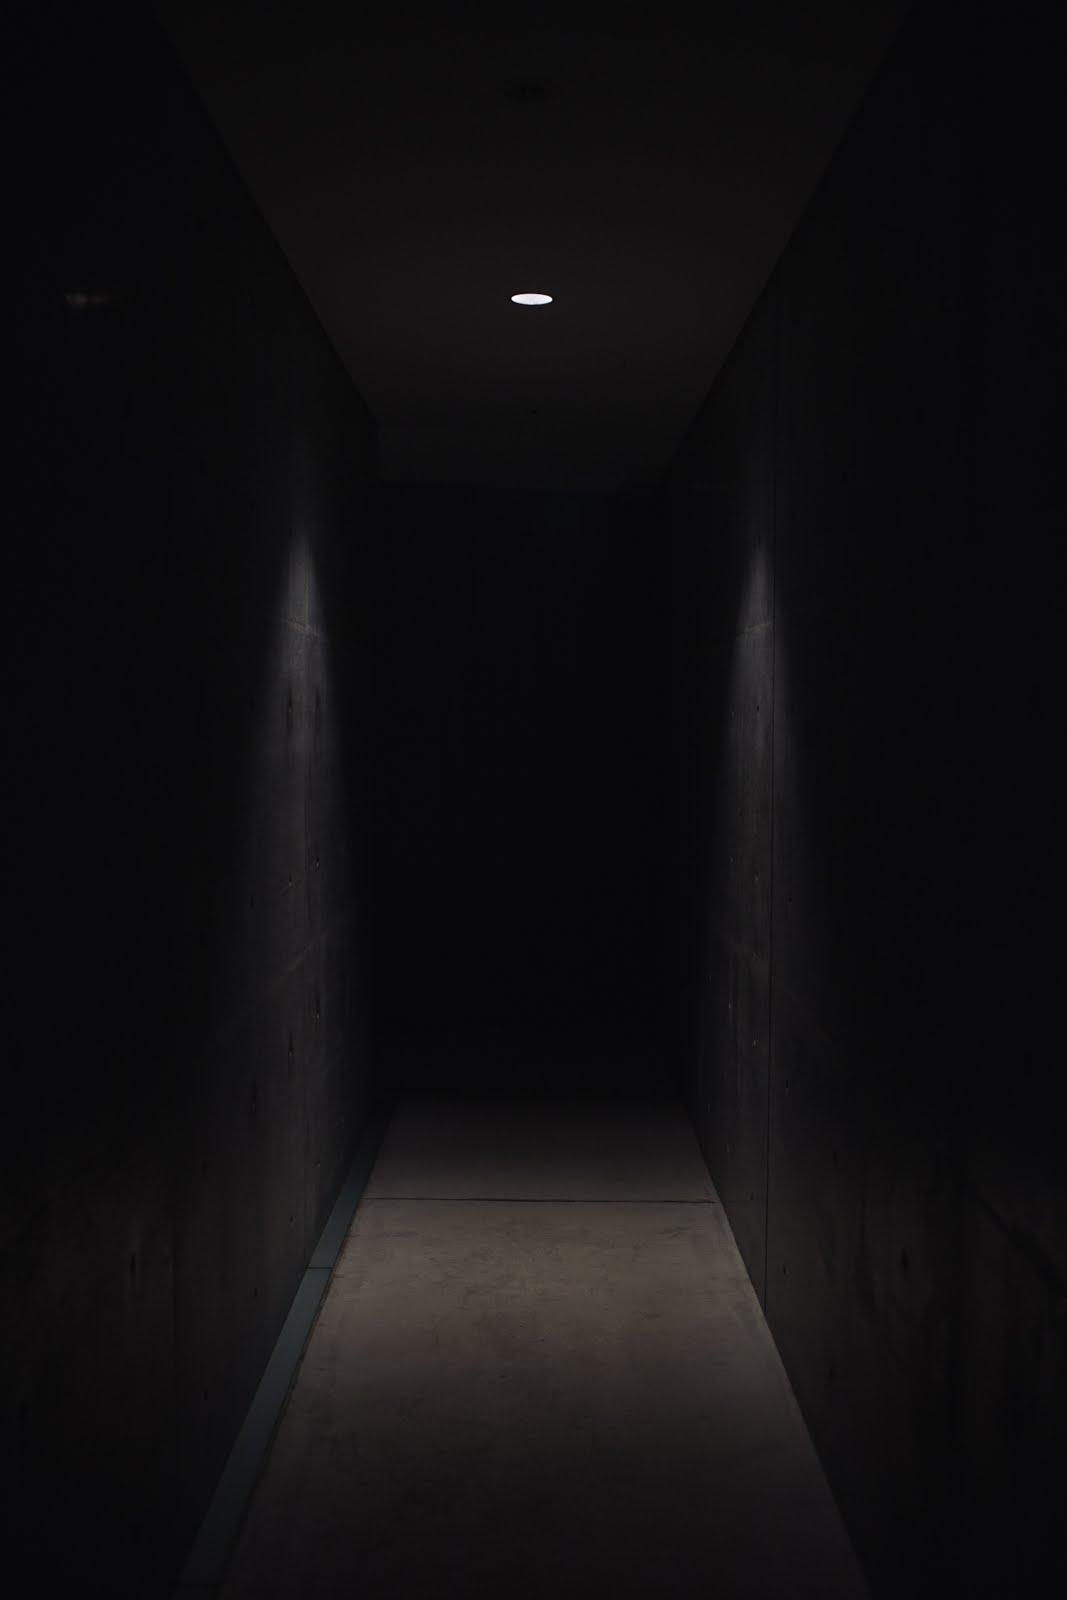 طريق مظلم مضئ بمصباح خافت